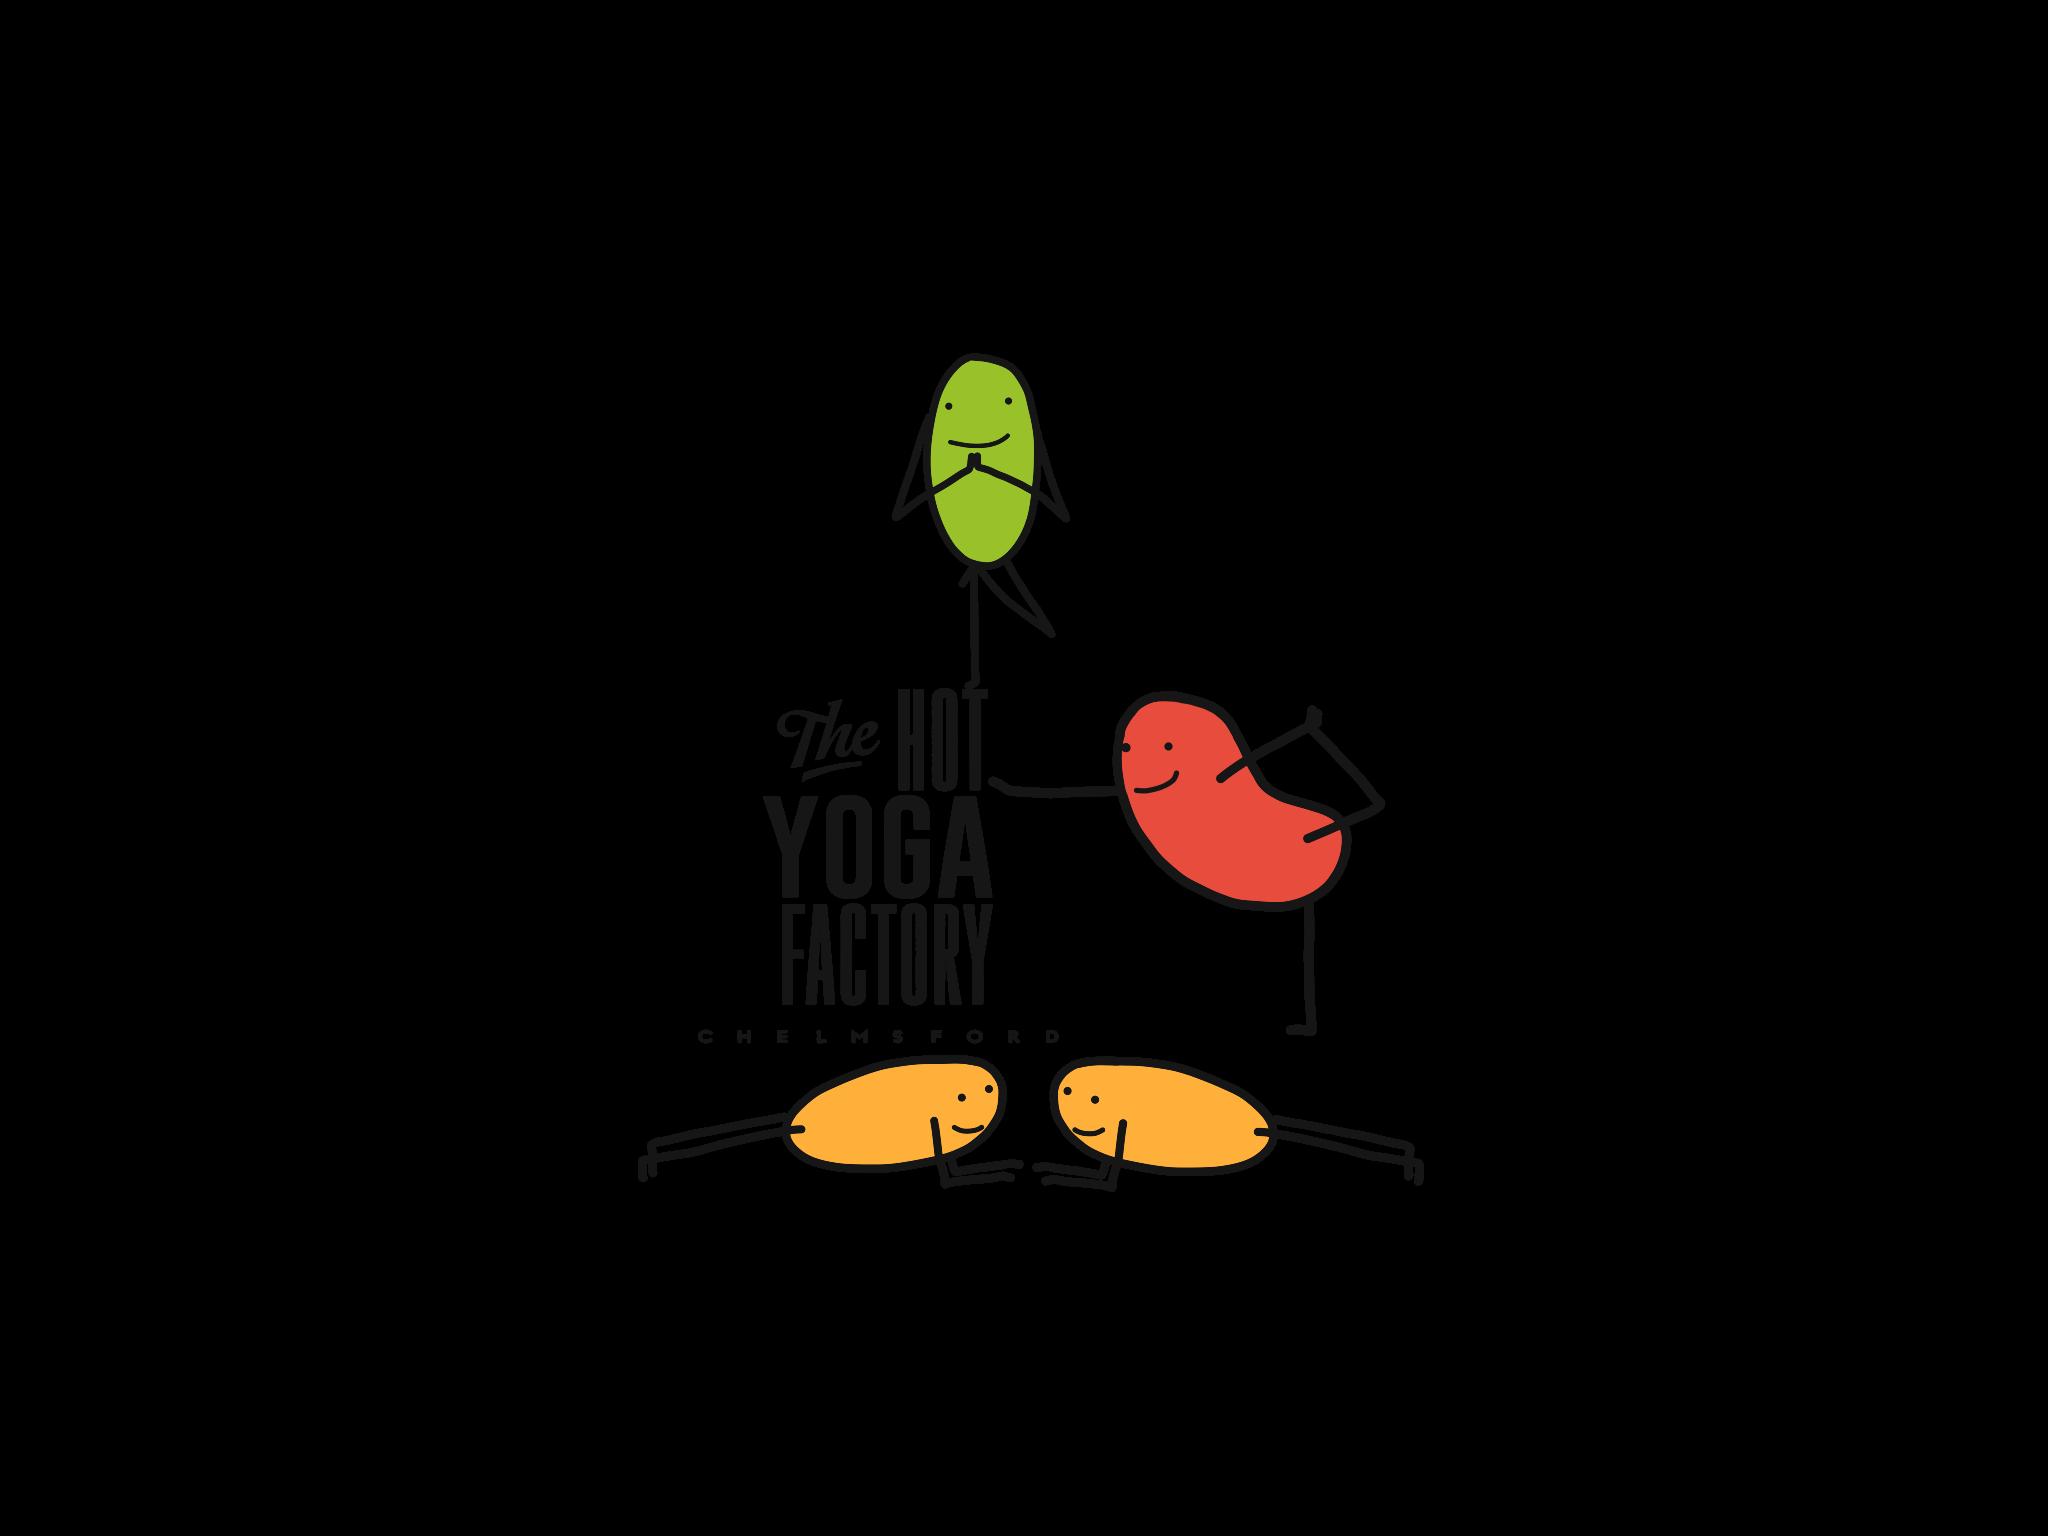 Commissioned graphic for yoga studio